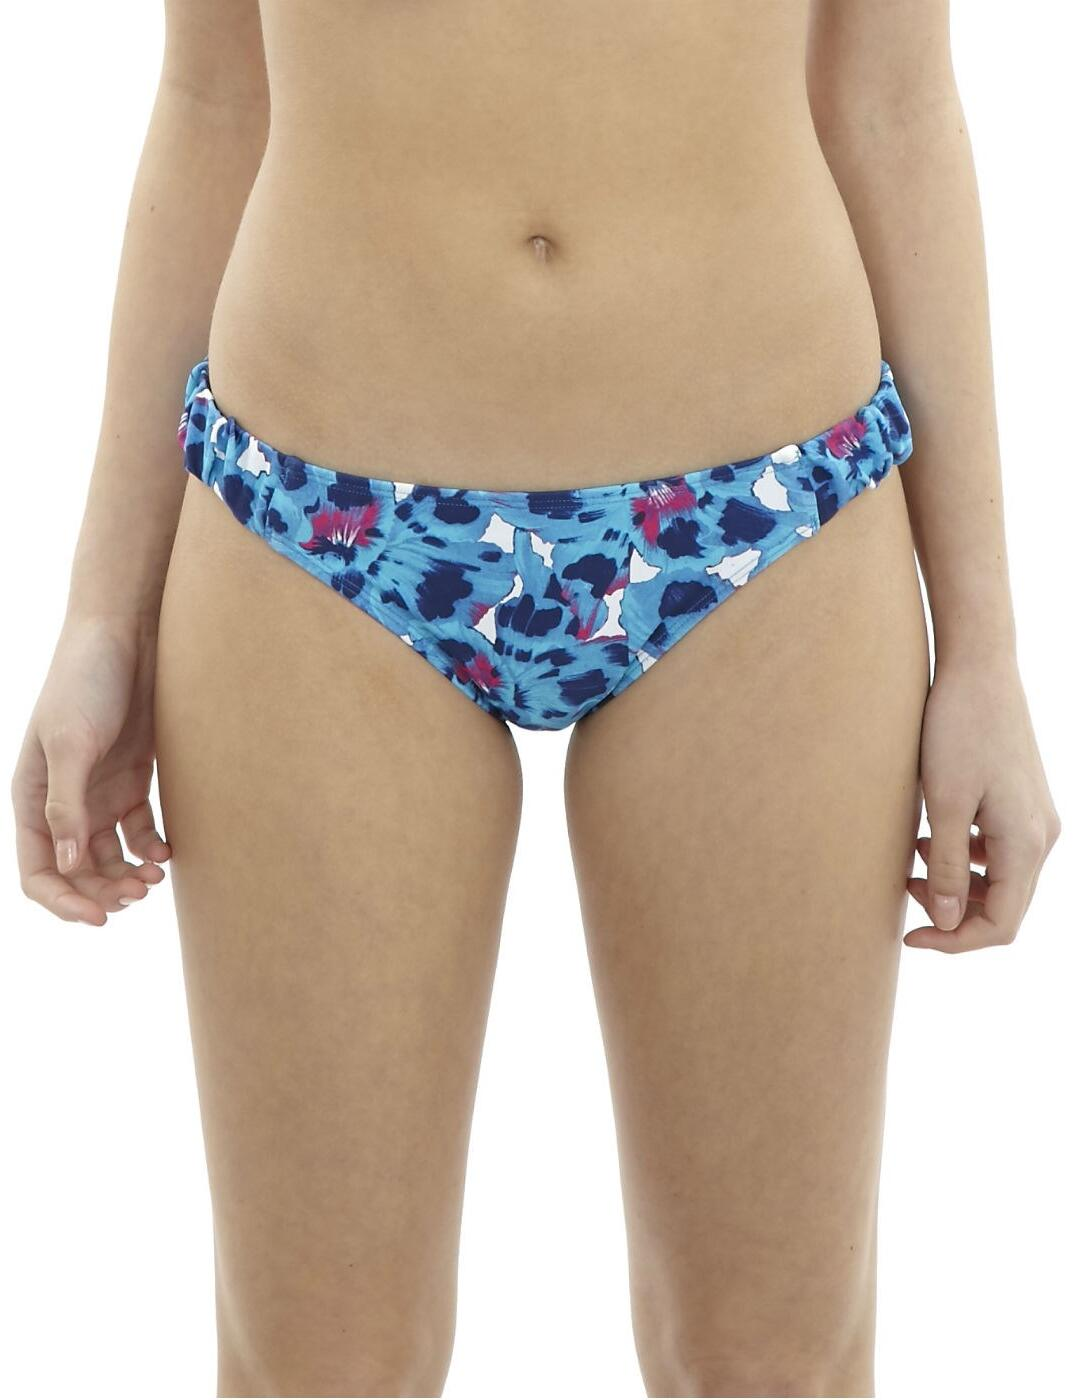 CW0206 Cleo Suki Gathered Bikini Brief - CW0206 Blue Floral